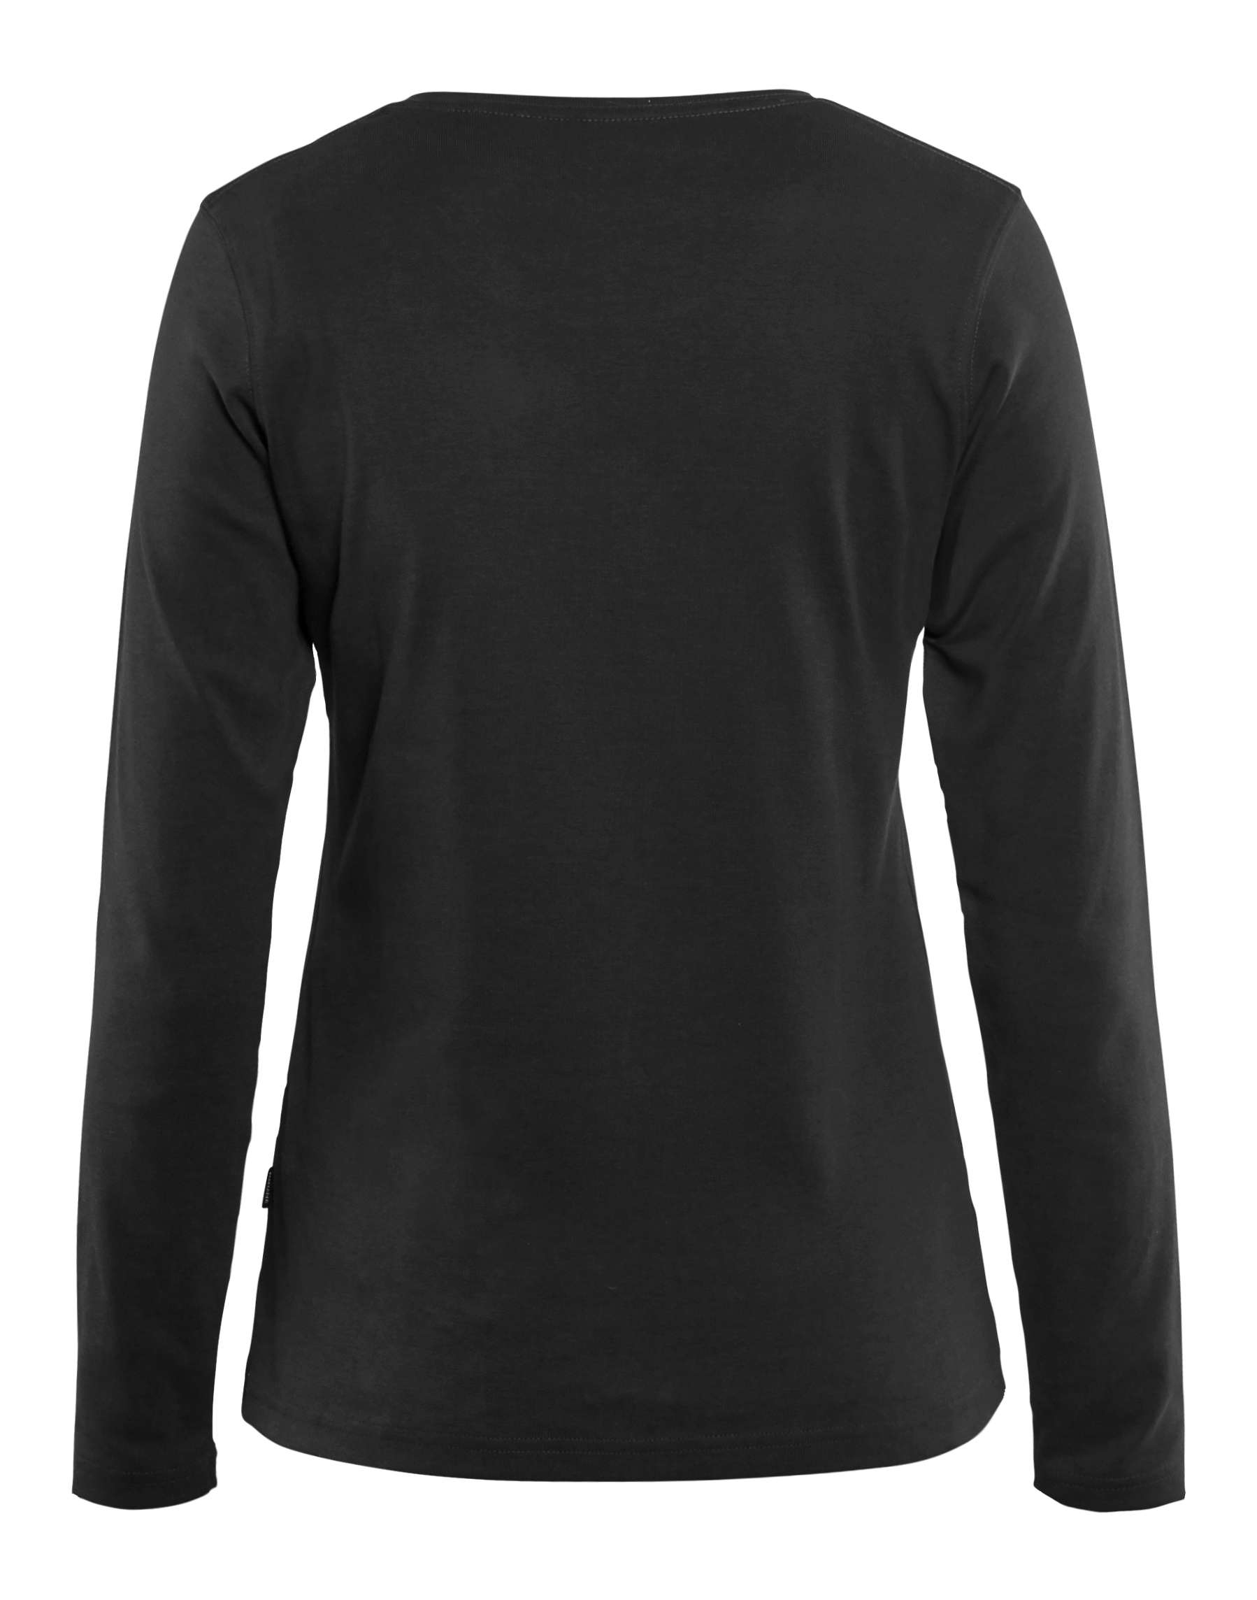 Blaklader Dames T-shirts 33011032 zwart(9900)